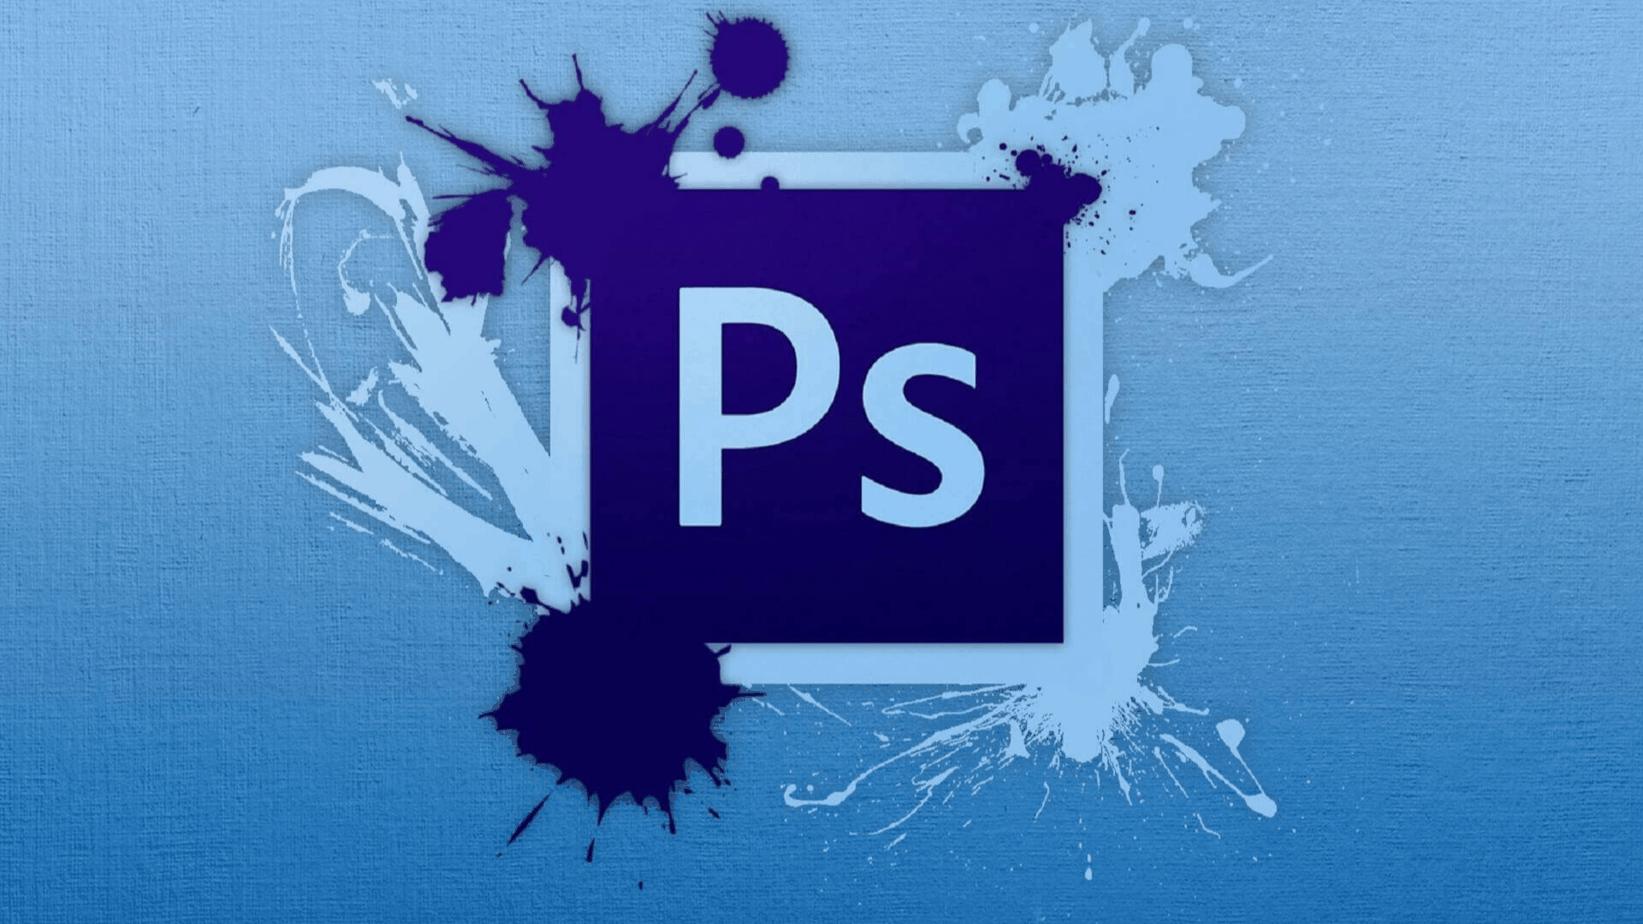 Adobe Photoshop hacks